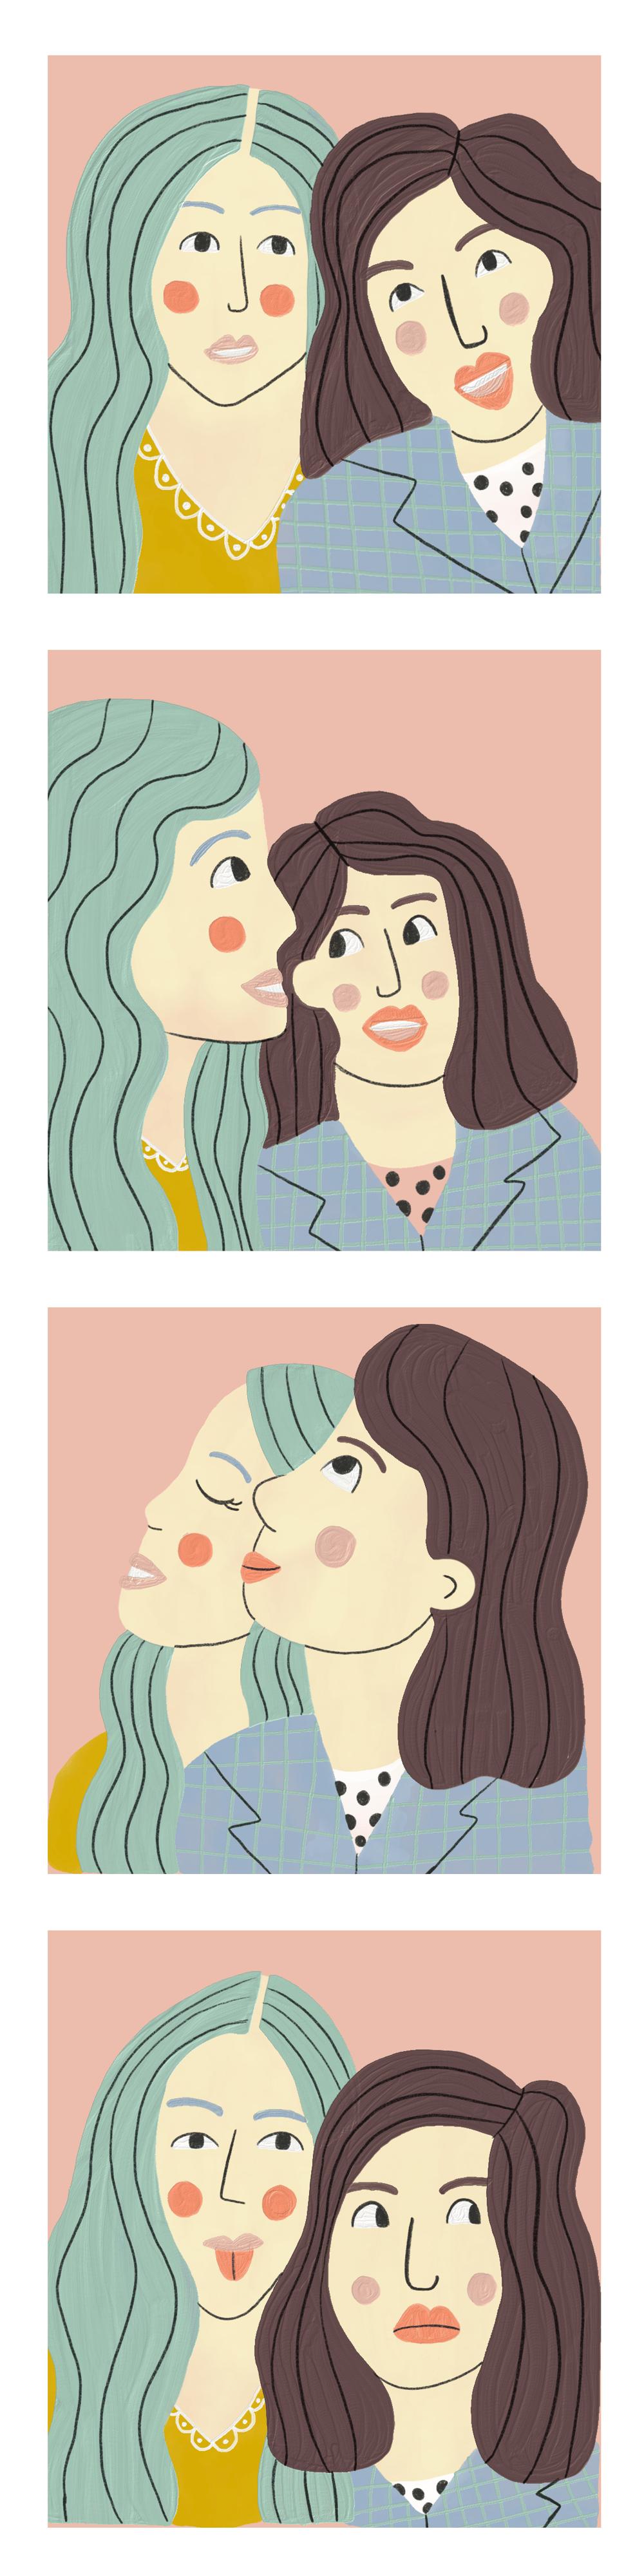 Fresco Portraits - image 1 - student project